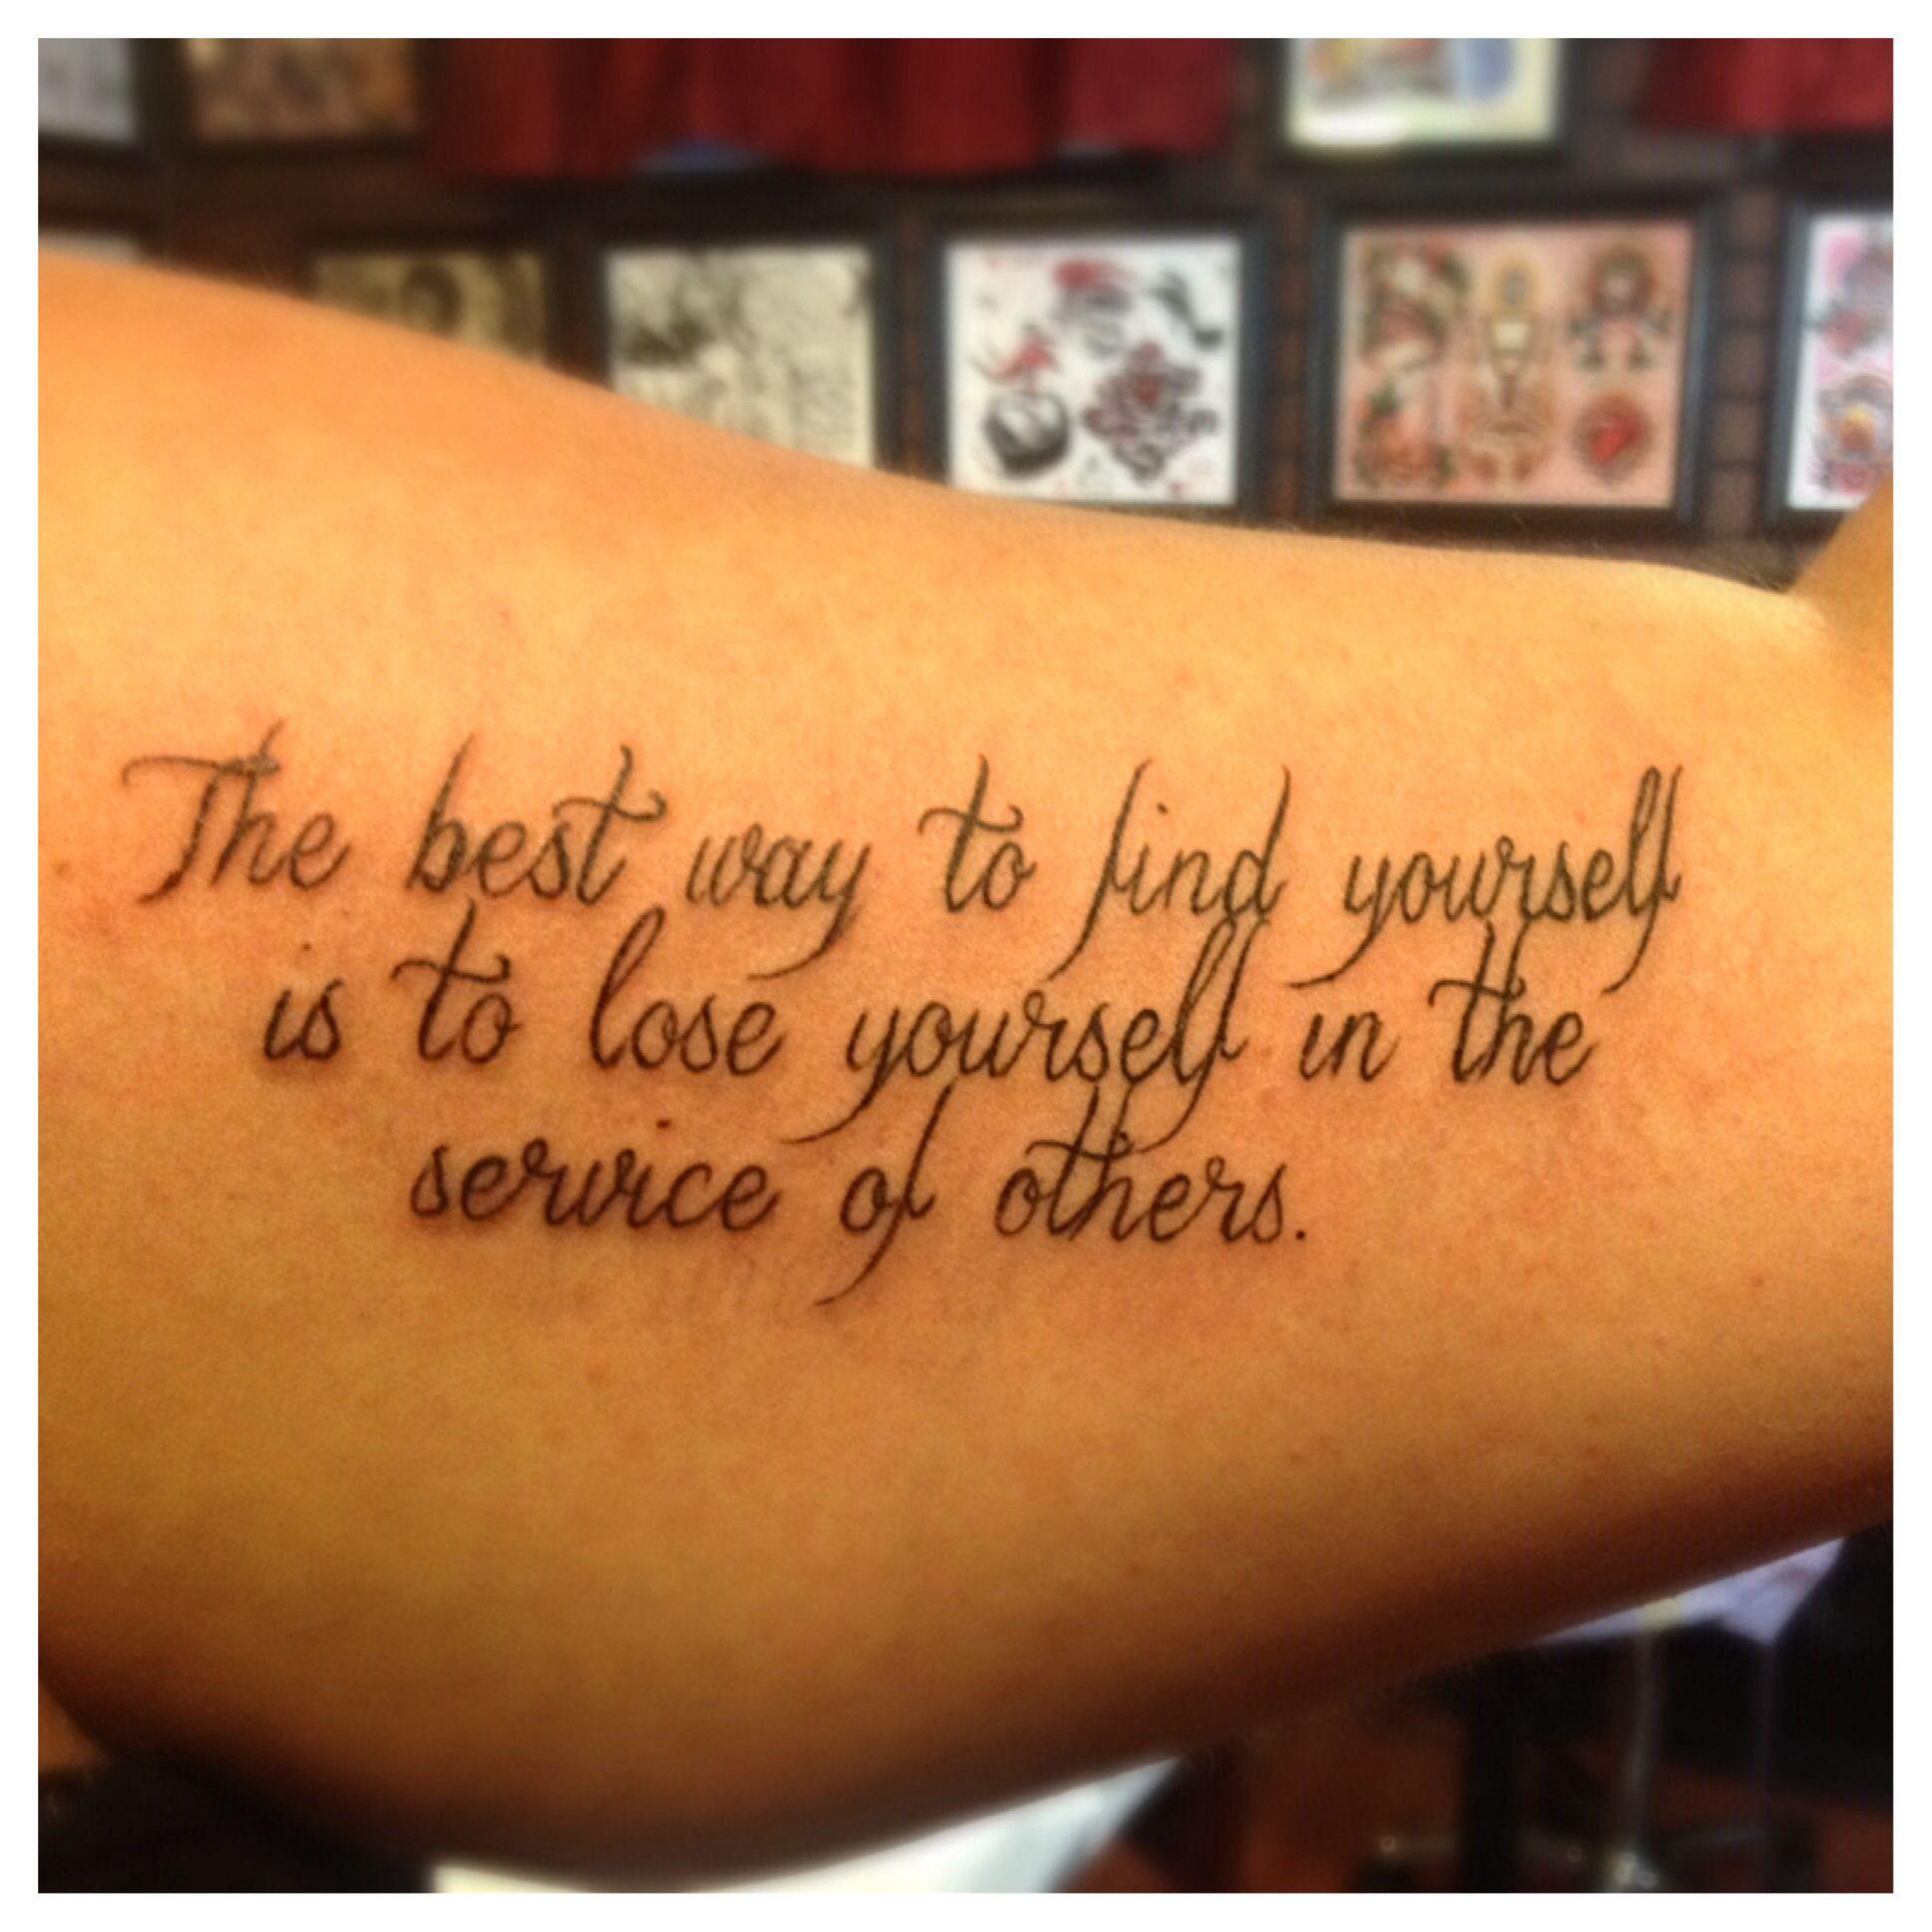 Tattoos tattoo ideas on pinterest rn - My New Inner Bicep Tattoo My Present To Myself For Graduating Nursing School